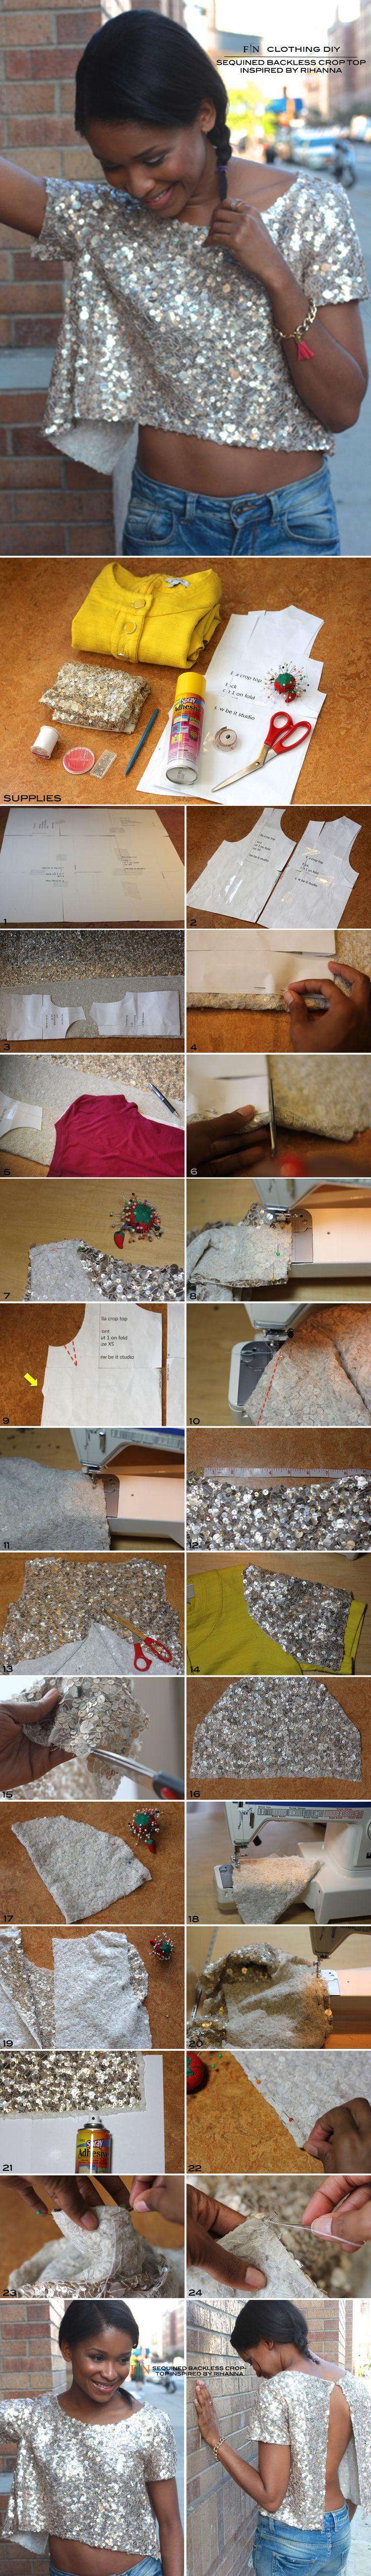 FRUGAL-NOMICS.COM DIY :: Sequin Backless Croptop Inspired by #Rihanna #diy #sequins